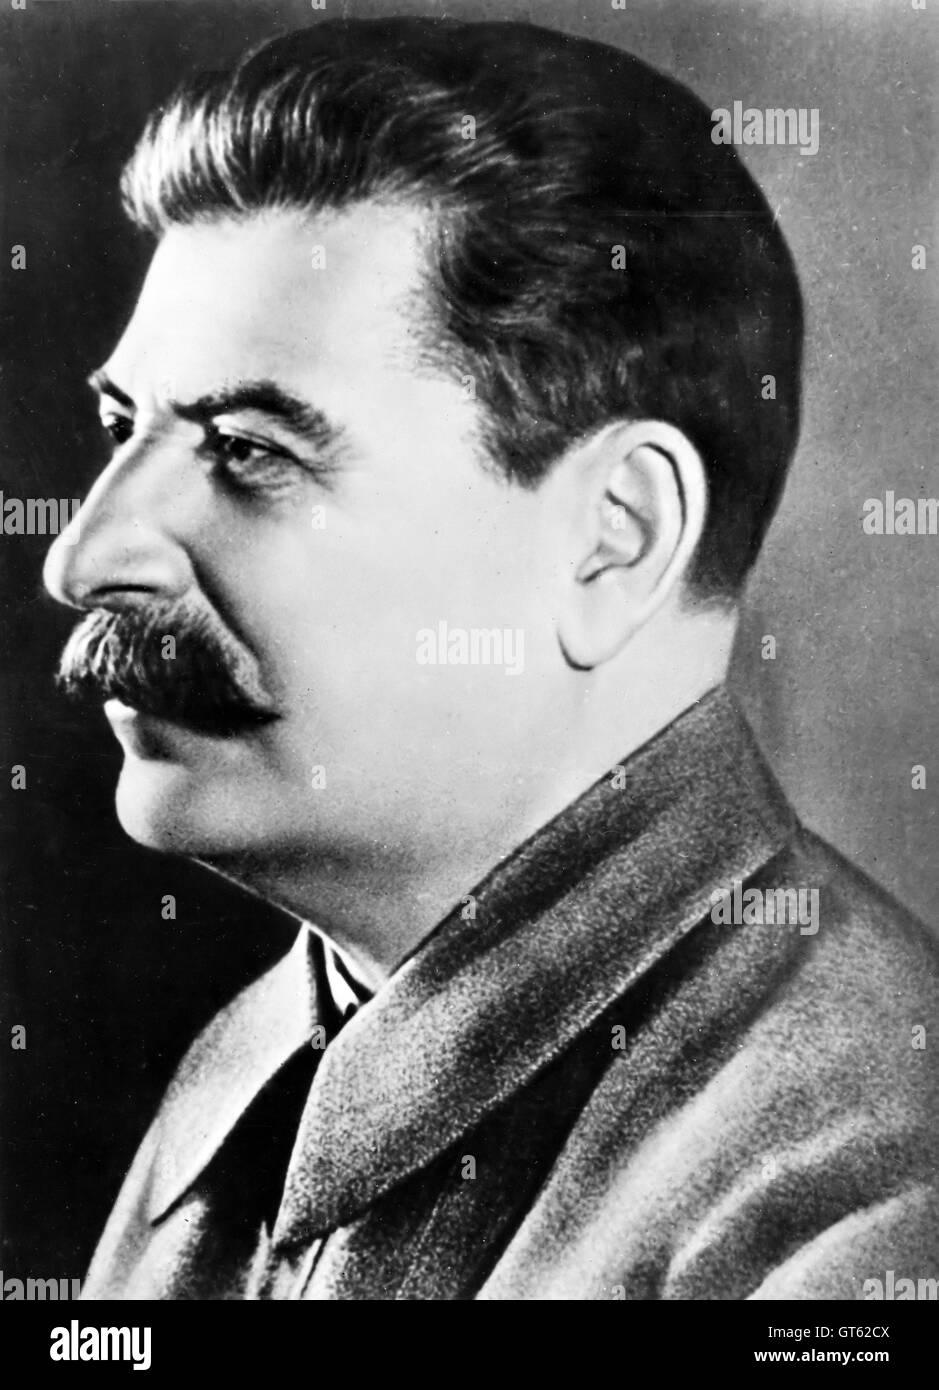 Stalin, Joseph Stalin, Secretary-general of the Communist party of Soviet Russia - Stock Image